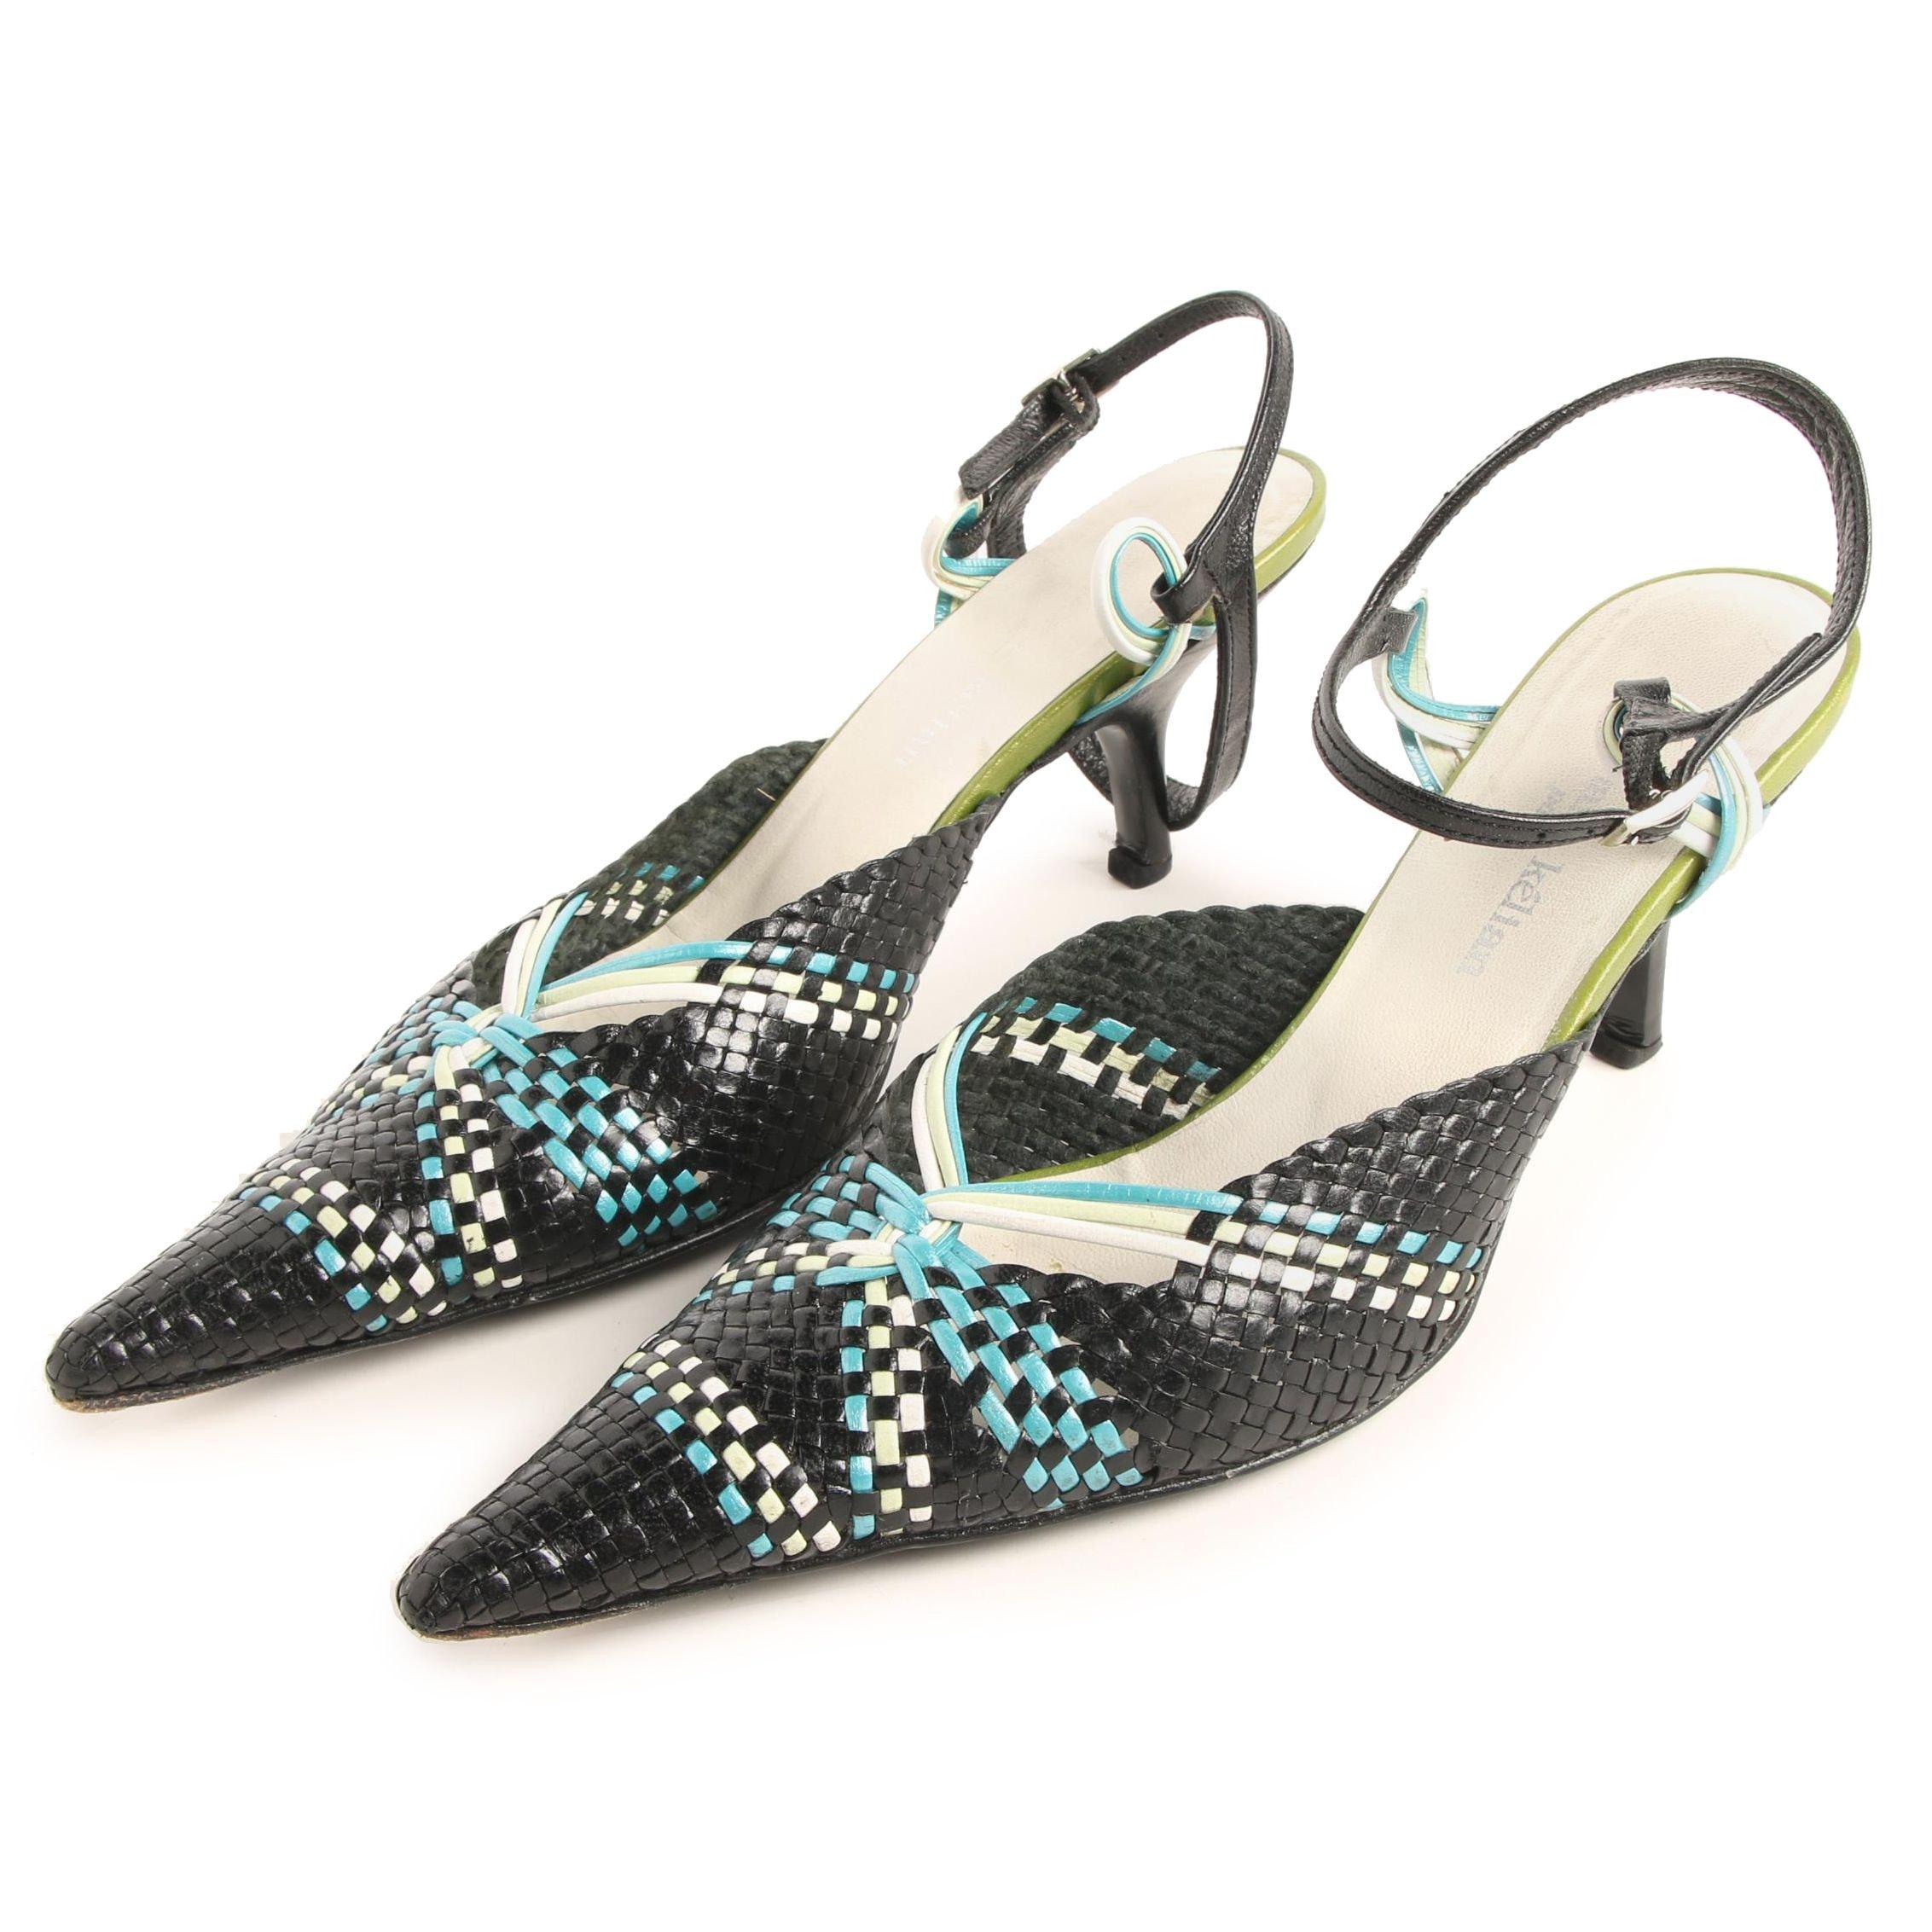 Stephane Kélian Paris Woven Leather Pointed Toe Ankle Strap Heels